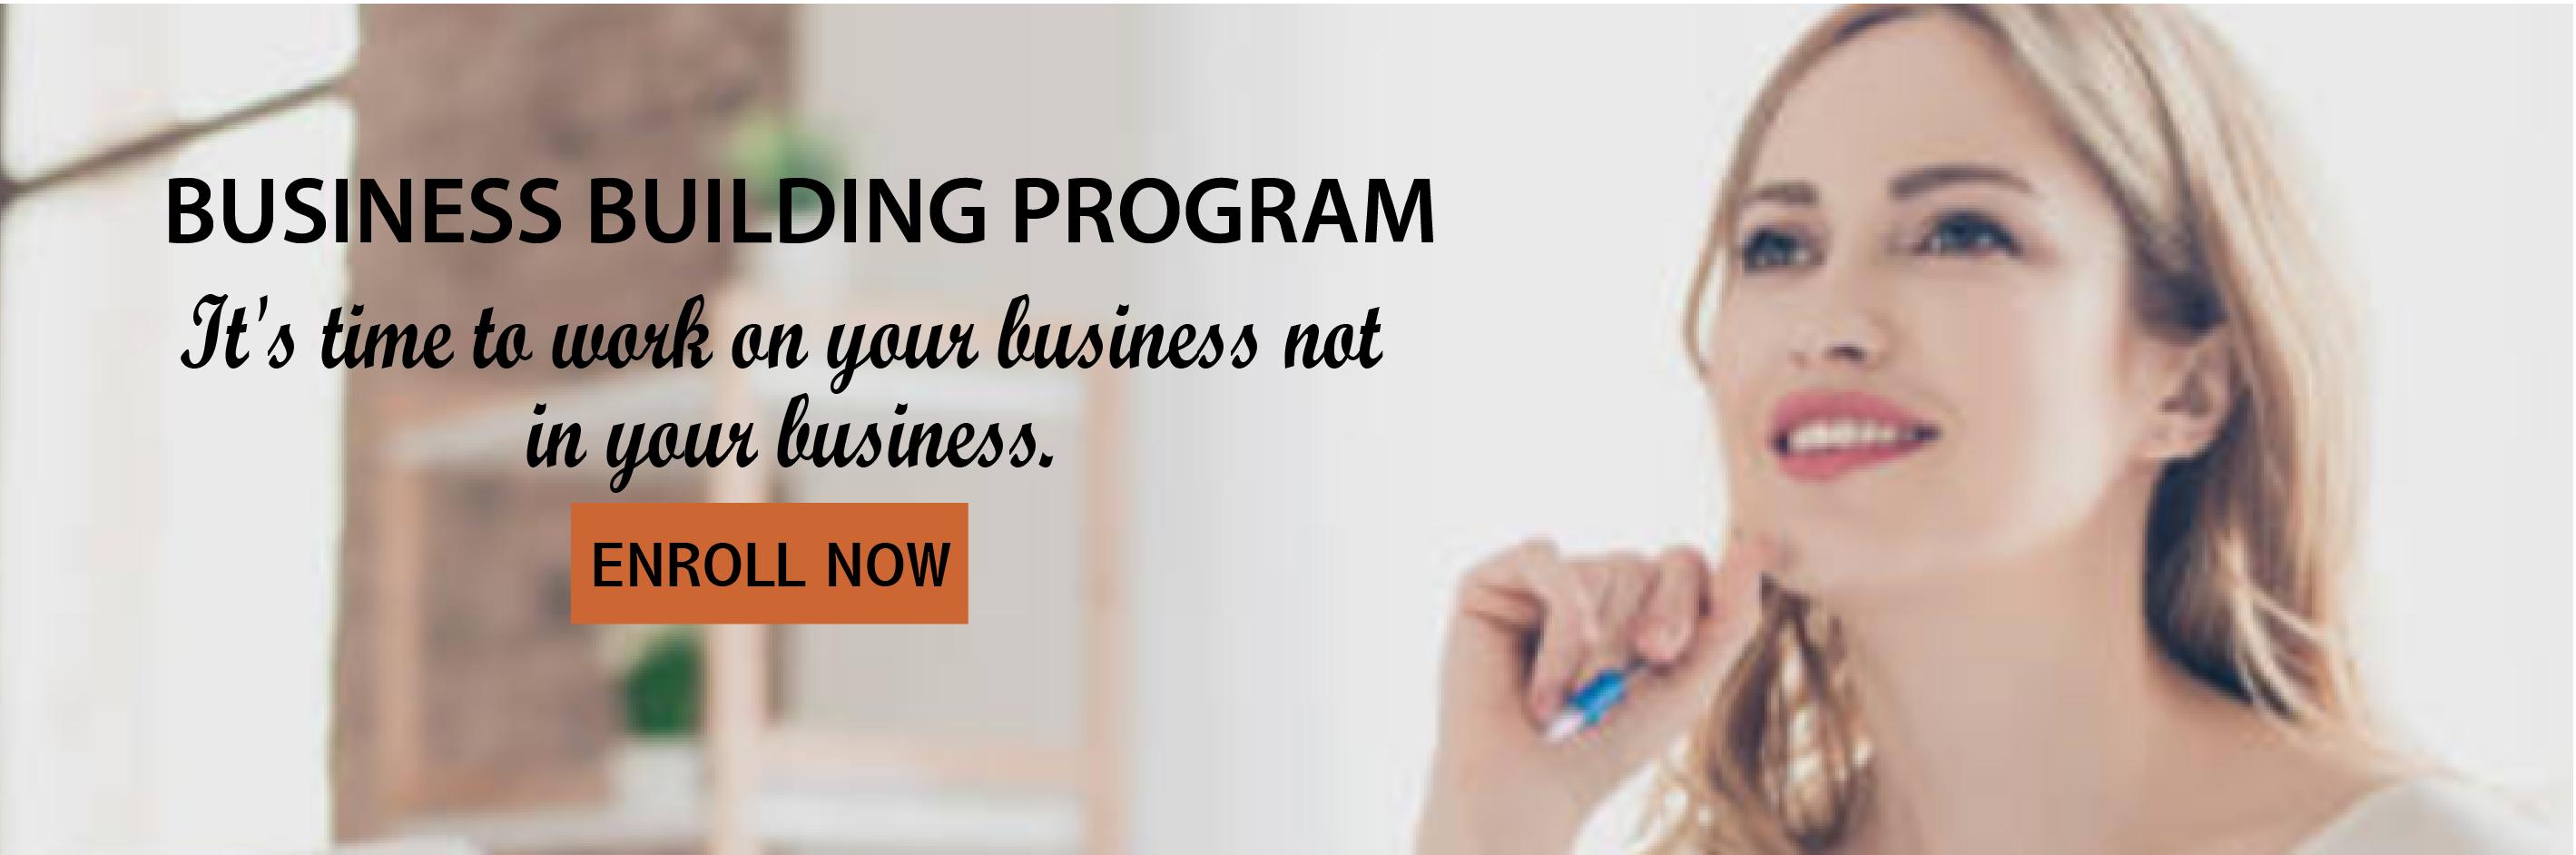 Business Building Program Growth